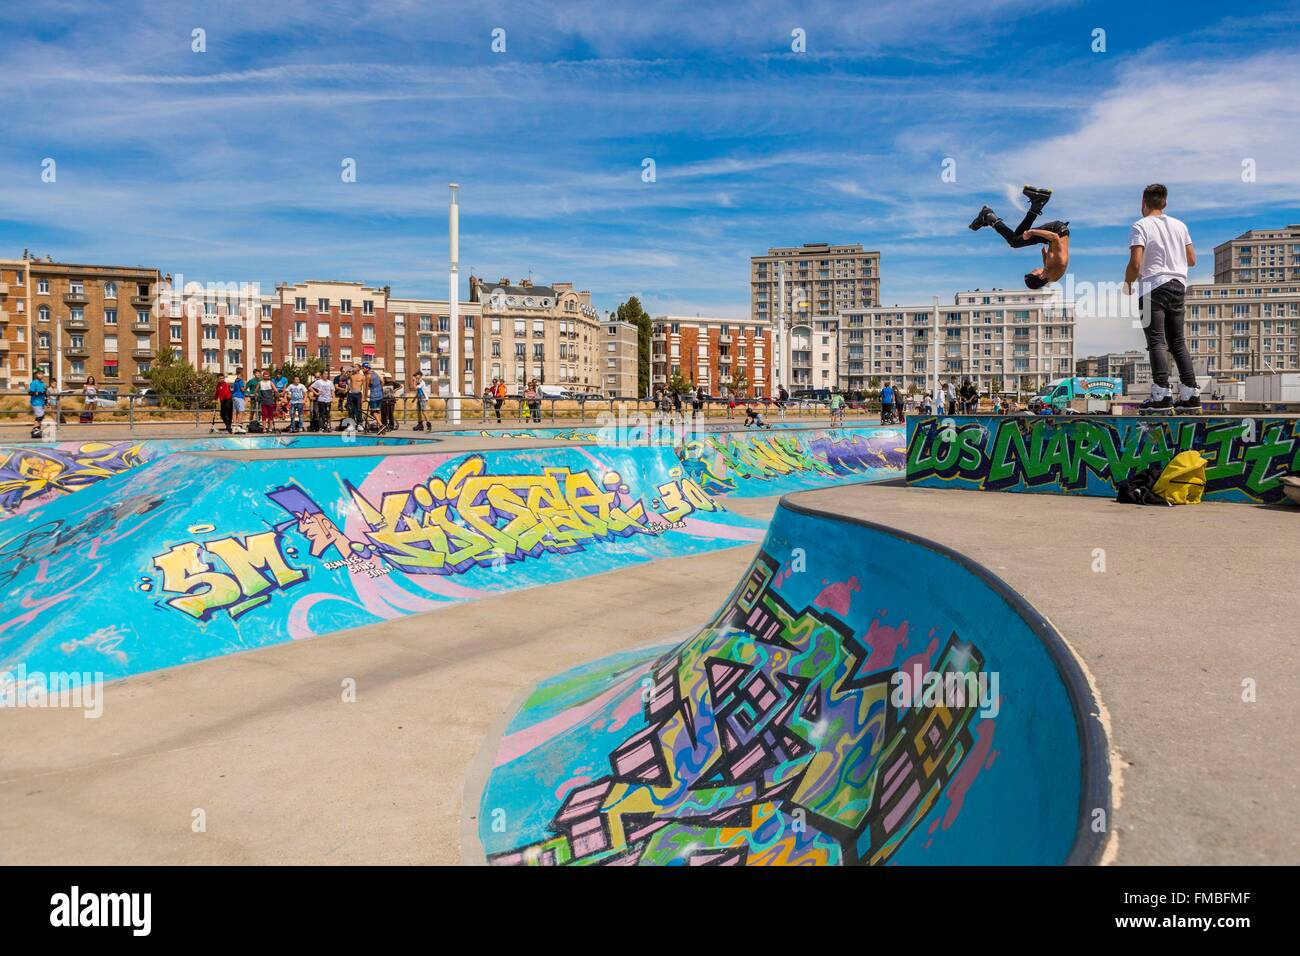 France, Seine Maritime, Le Havre, the skate park - Stock Image